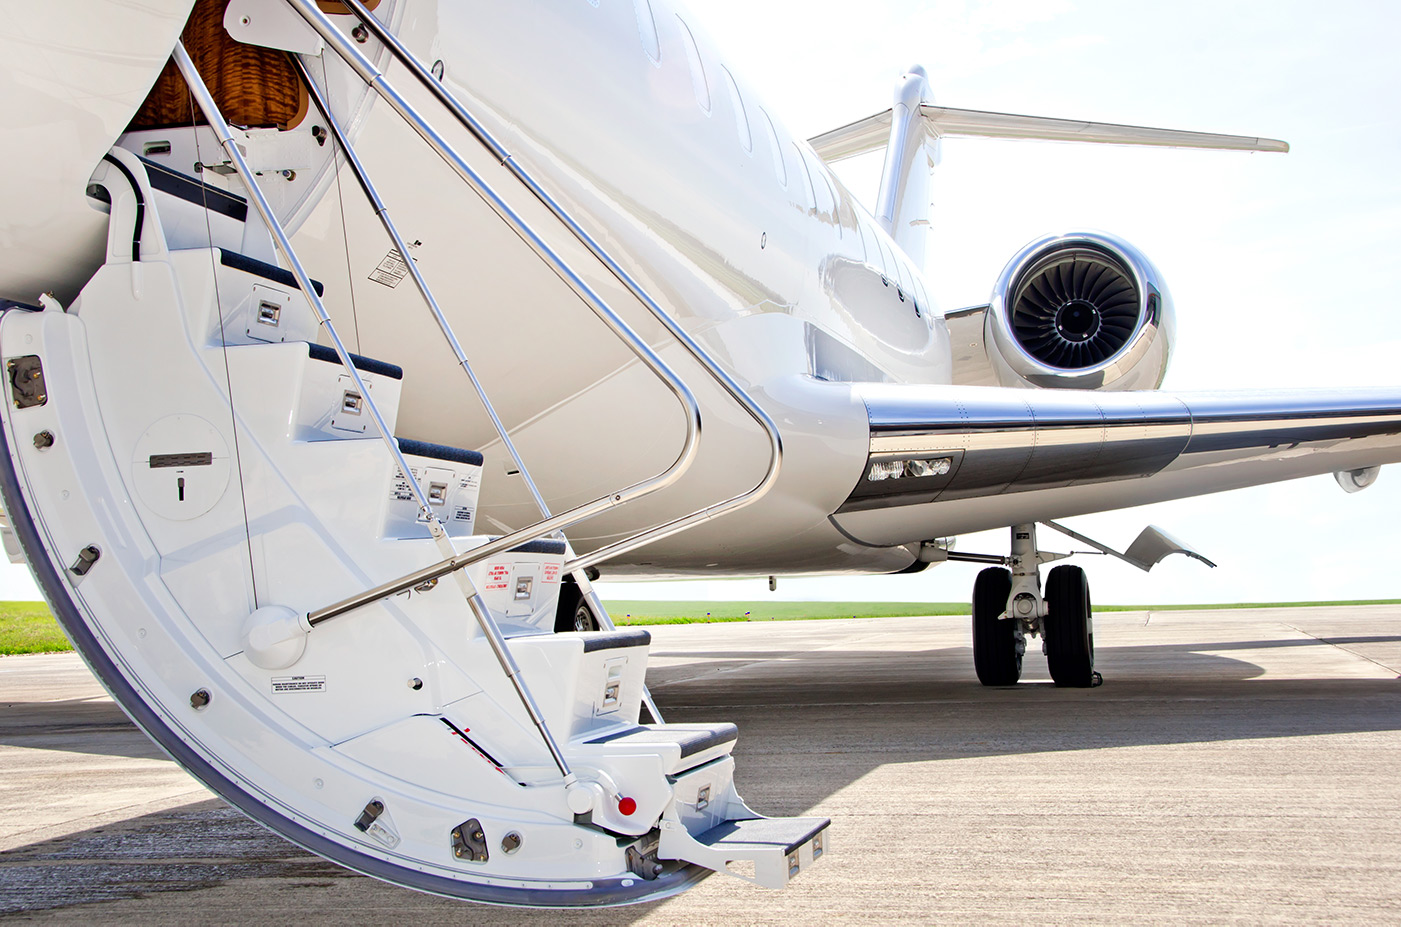 world's best private jet